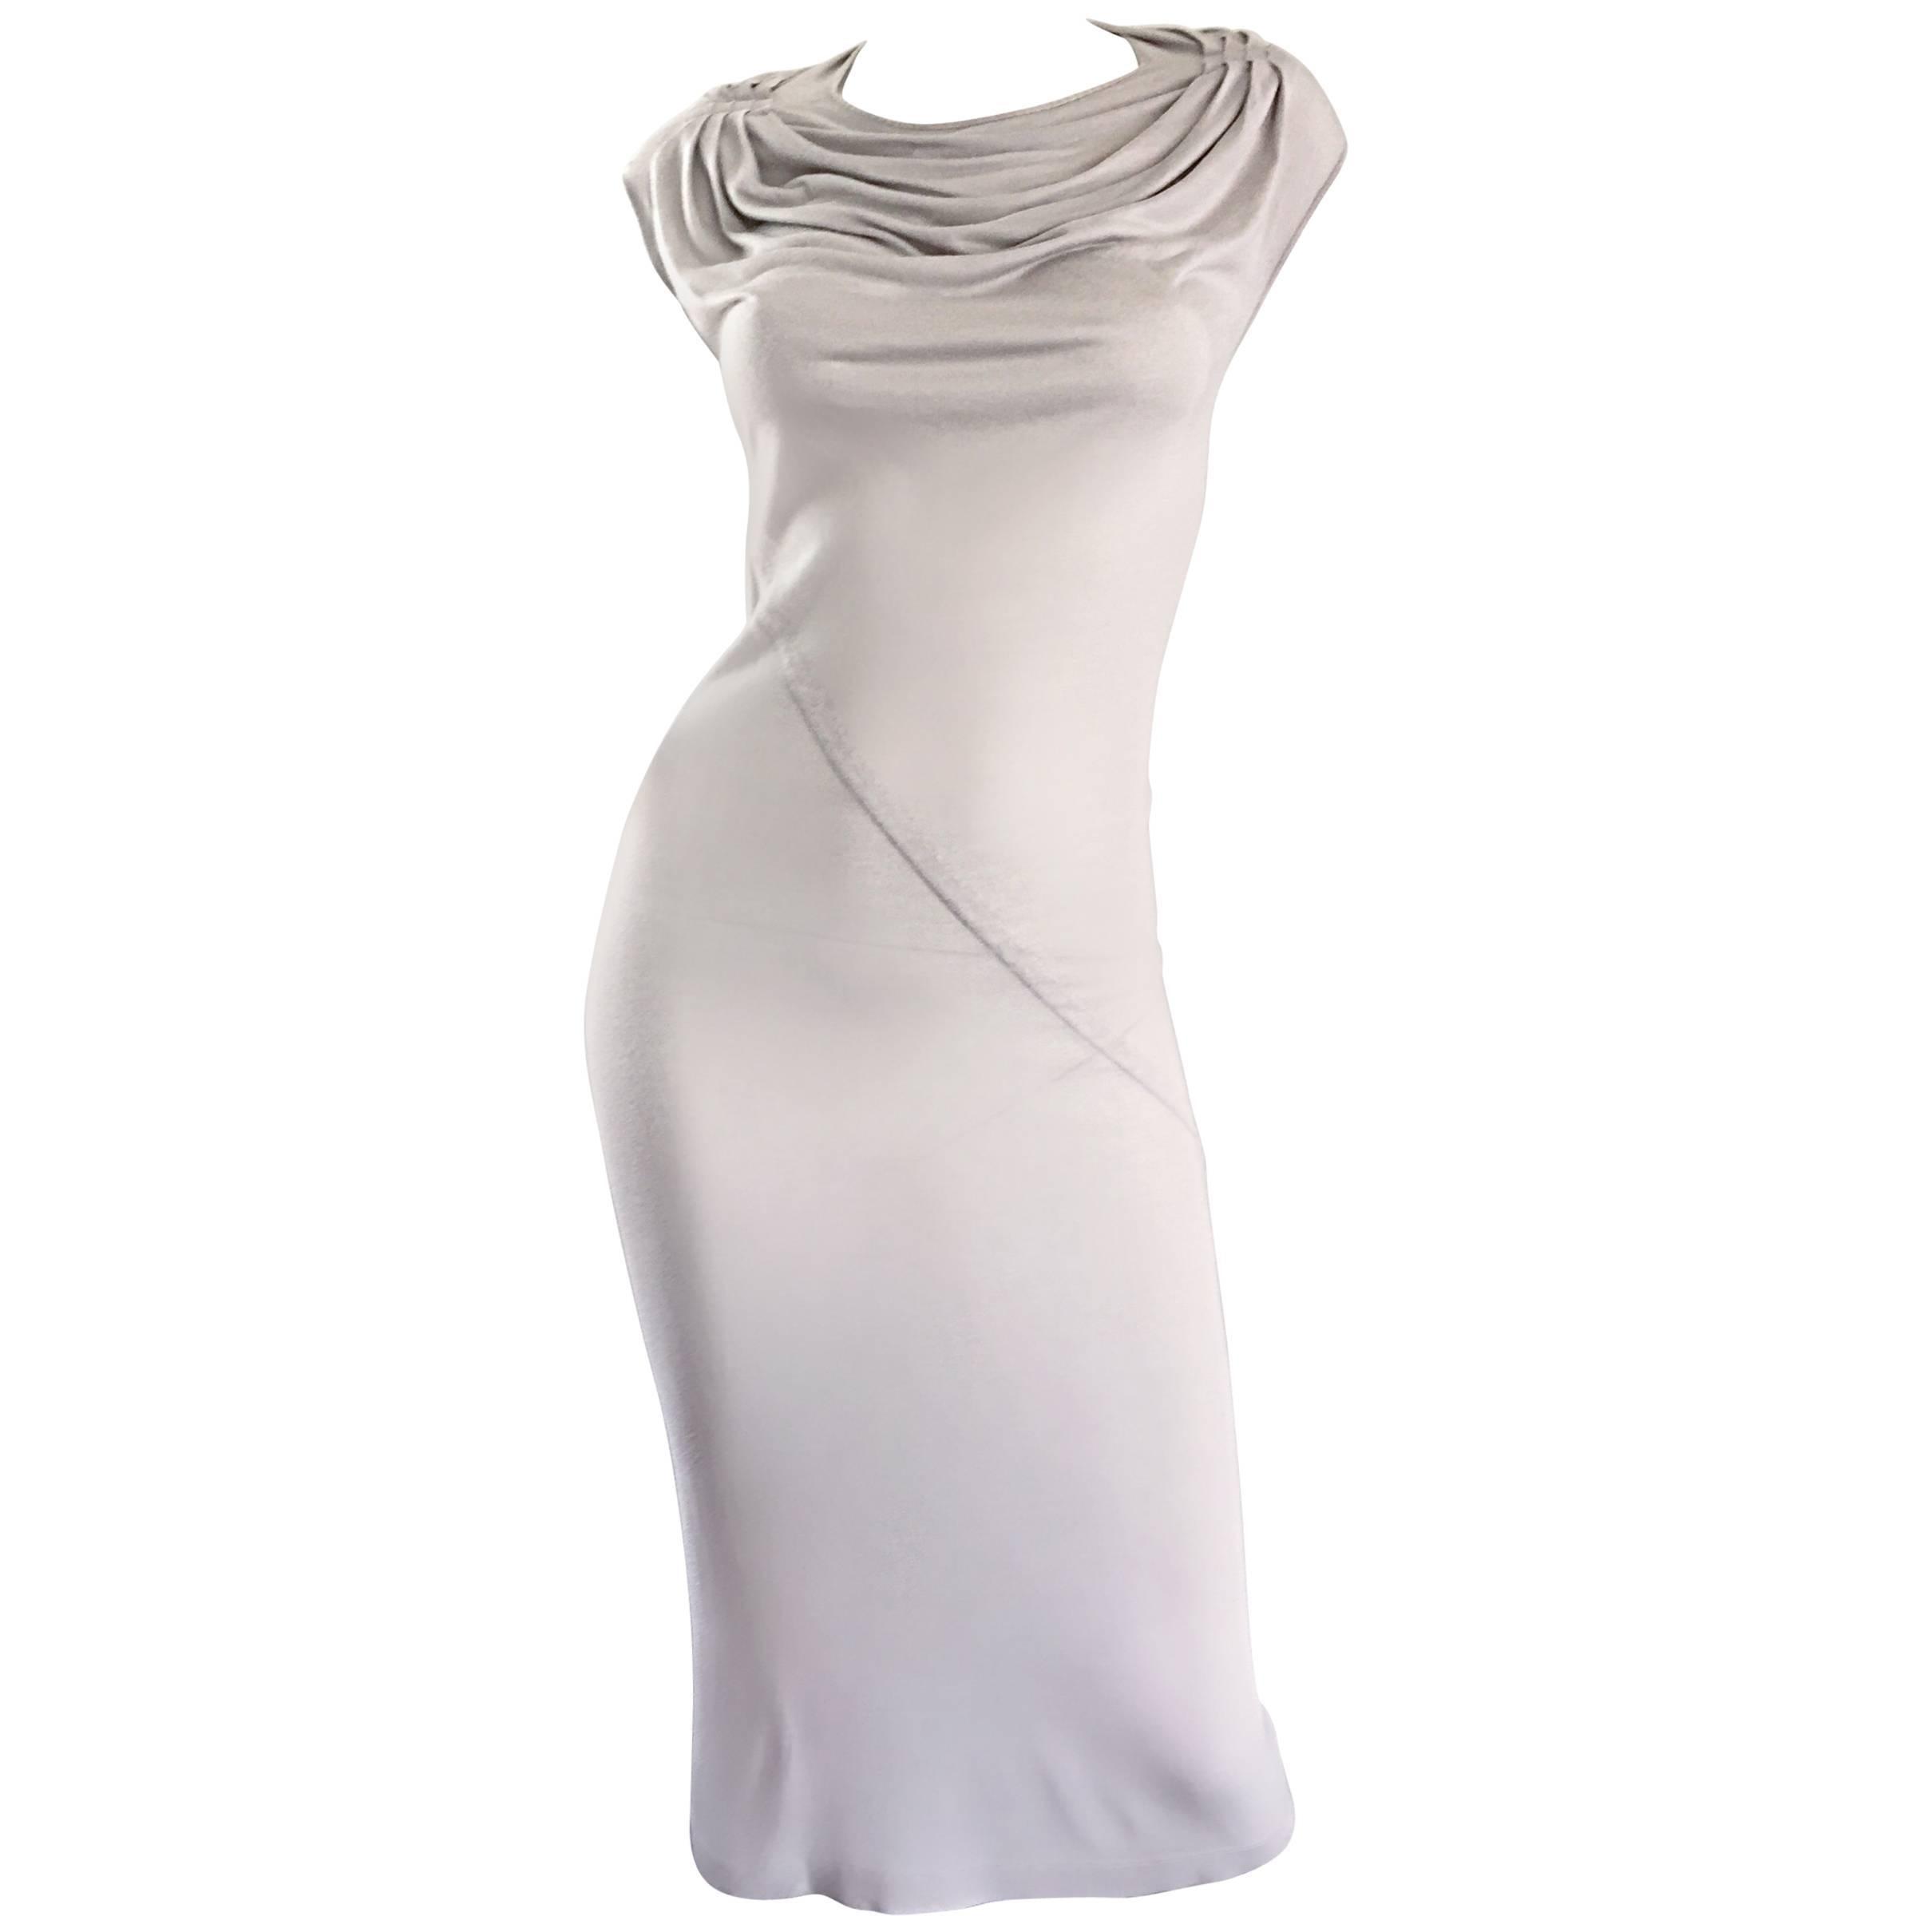 "Rick Owens "" Vicious "" Pearl SS 2014 Light Gray Draped Body Con T Shirt Dress"